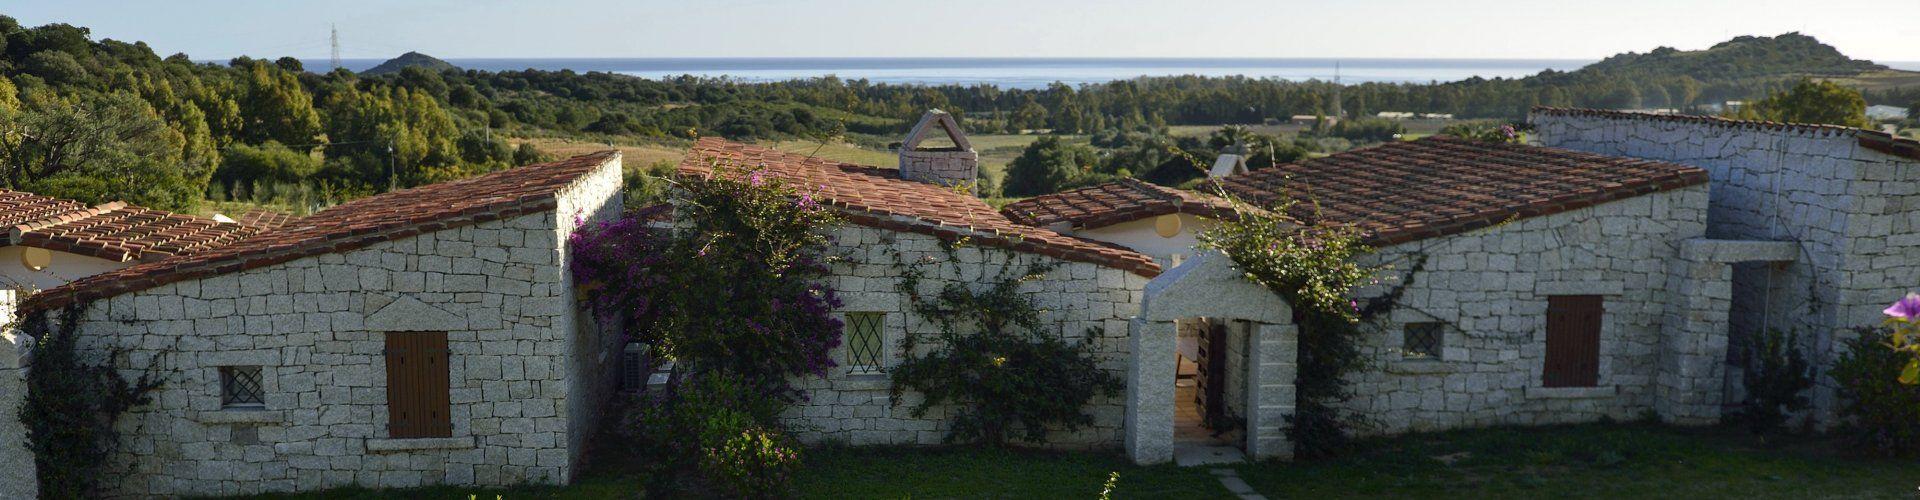 große Ferienvilla im Villaggio mit Meerblick in Cala Sinzias